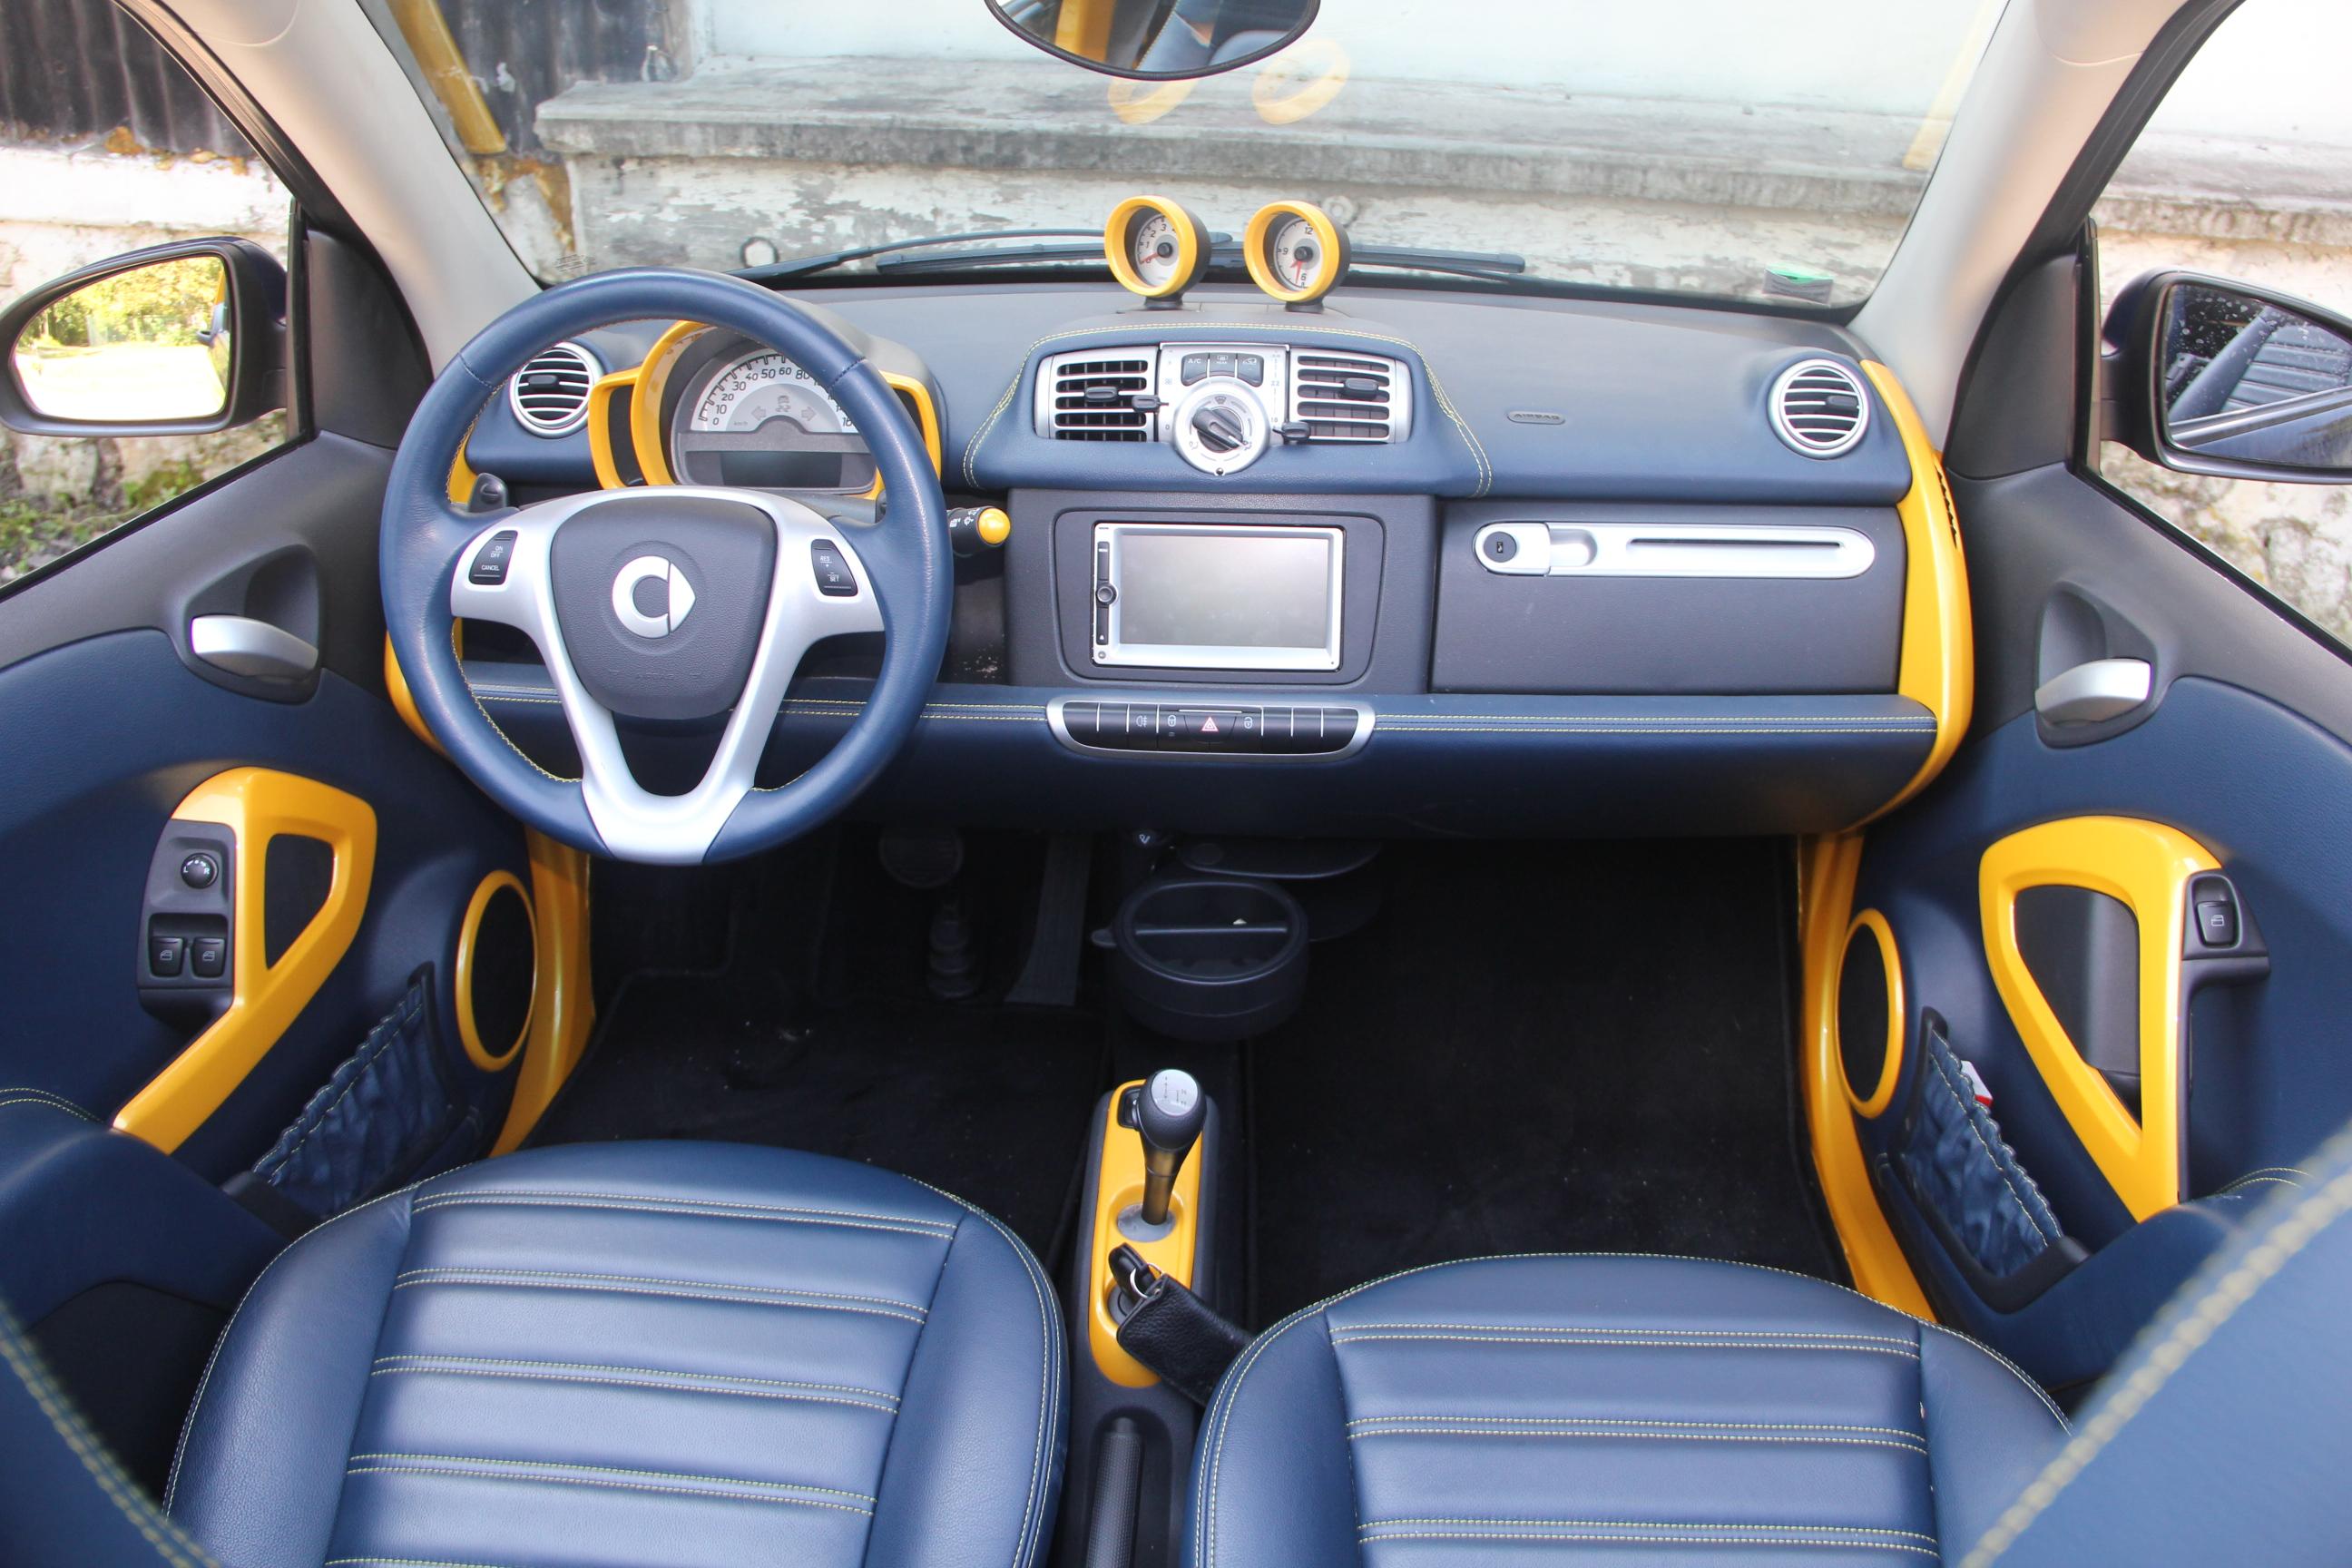 Essai smart fortwo mhd cabriolet cab 39 de poche for Interieur smart 2000